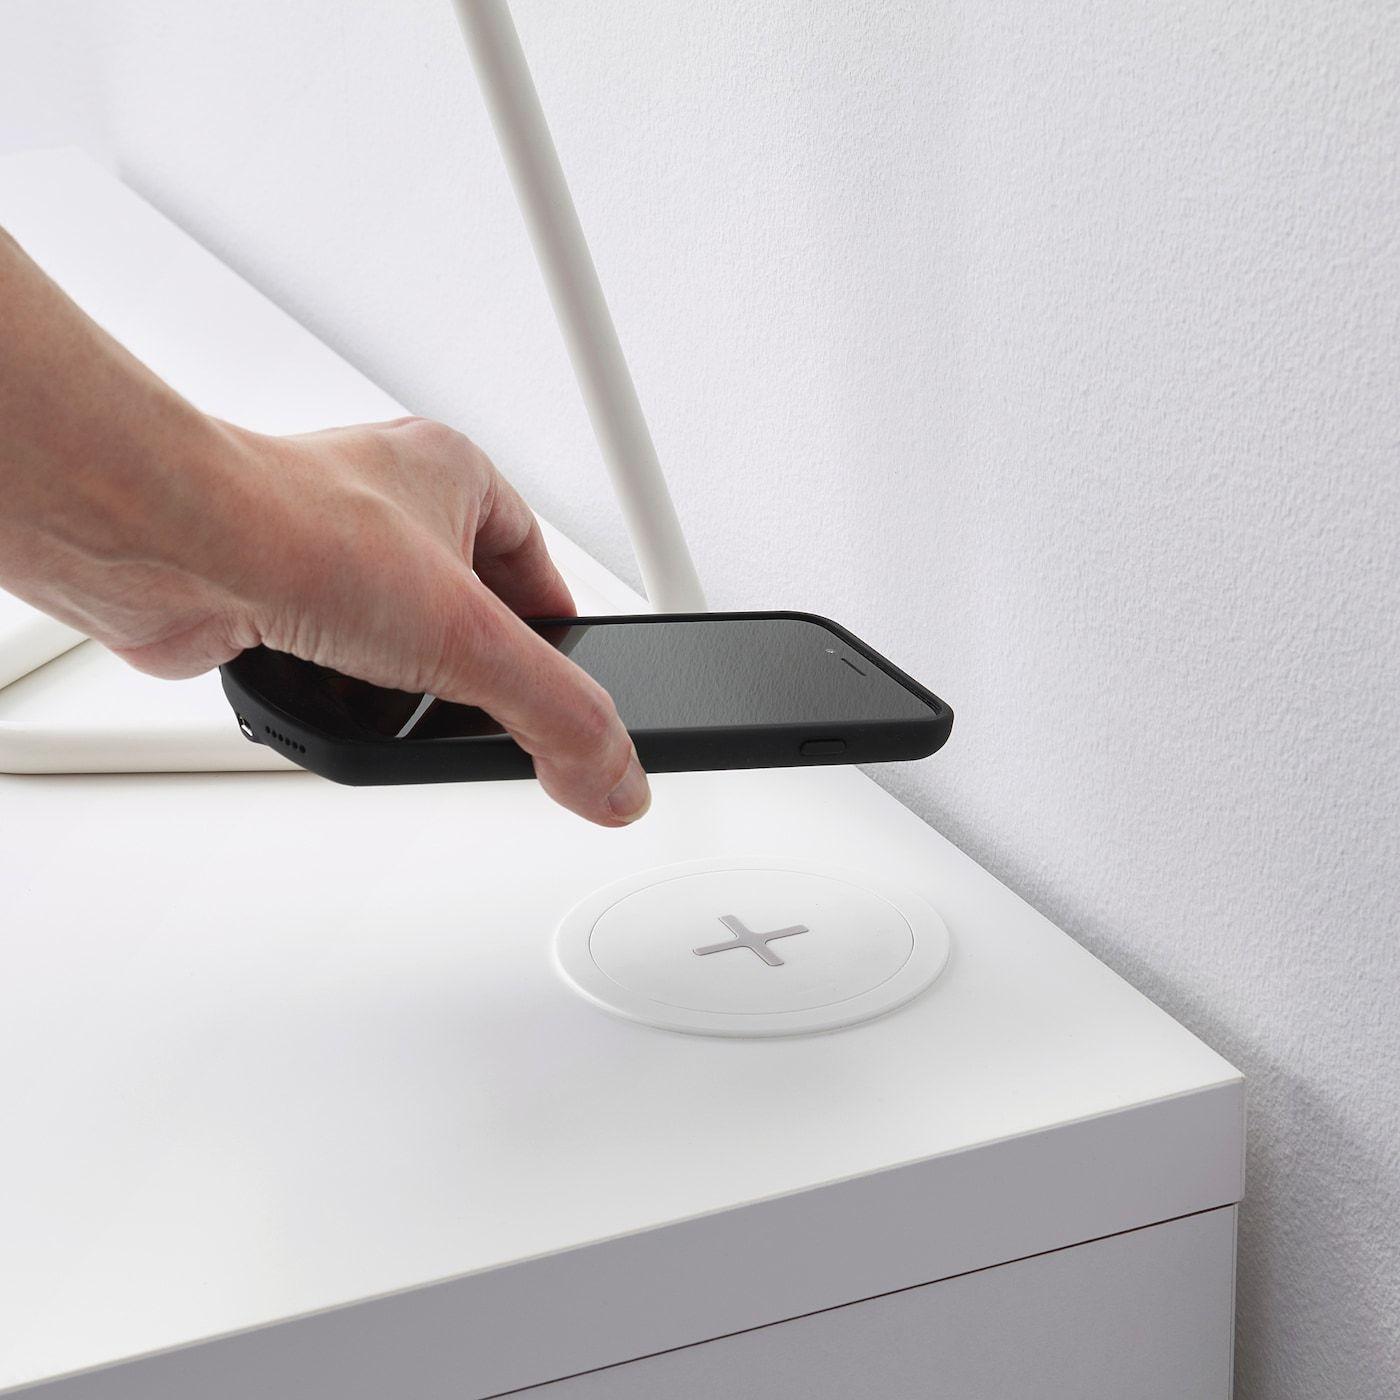 NORDMÄRKE Wireless Charger - White, Cork In 2020